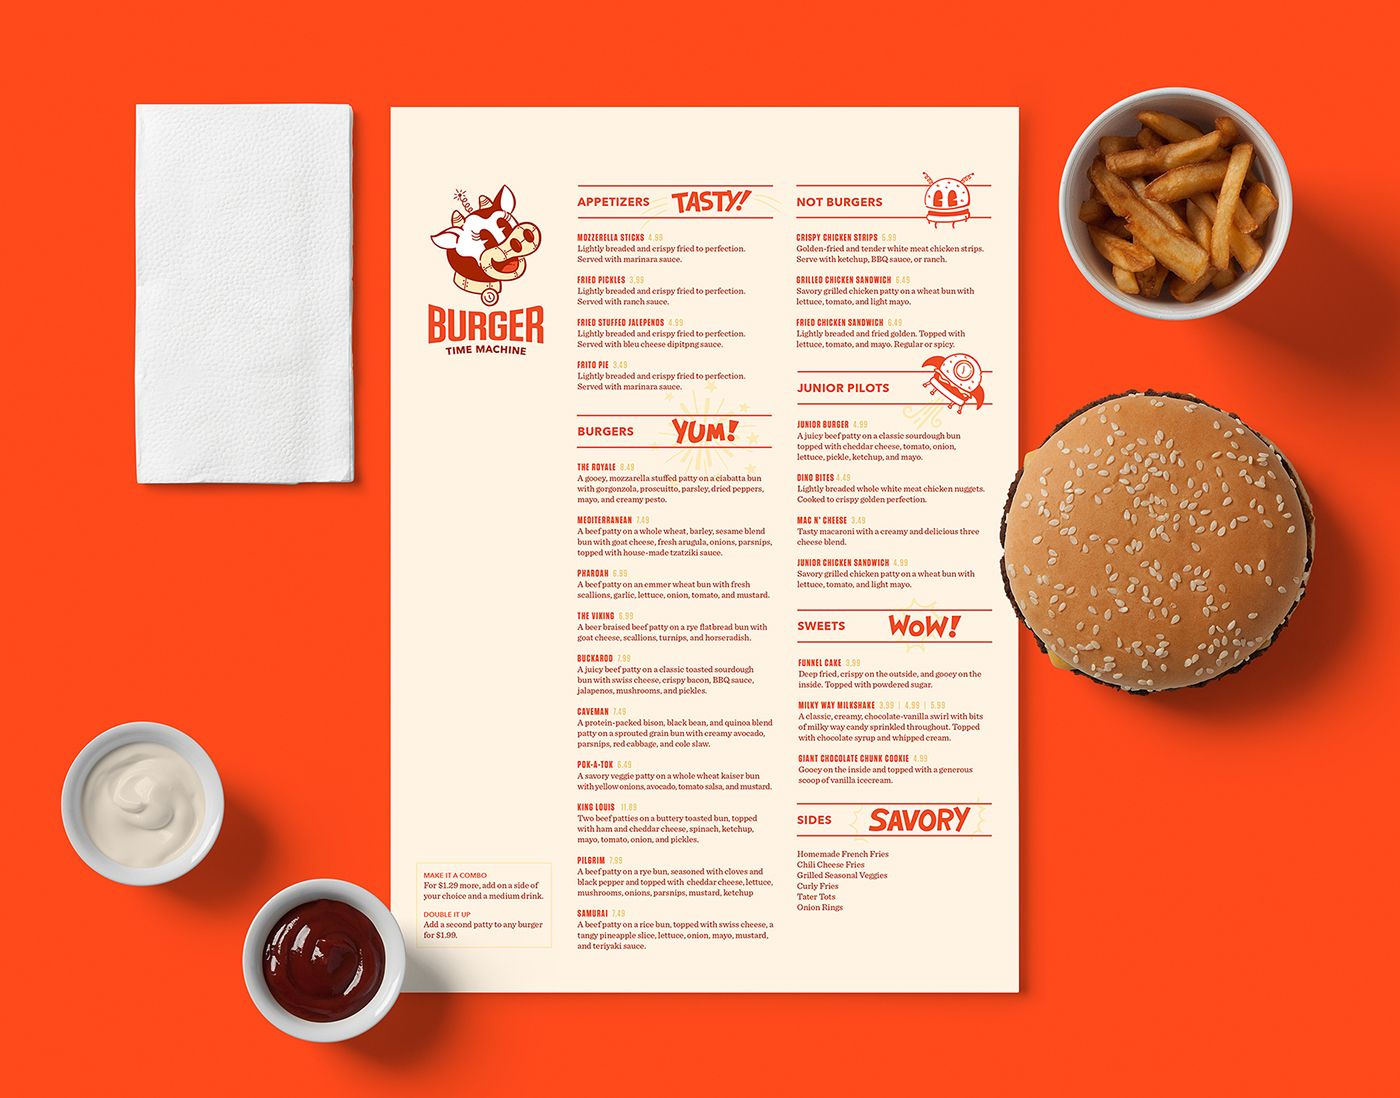 Check Out This Behance Project Burger Time Machine Https Www Behance Net Gallery 49810887 Burger Time Machine Burger Menu Restaurant Food Menu